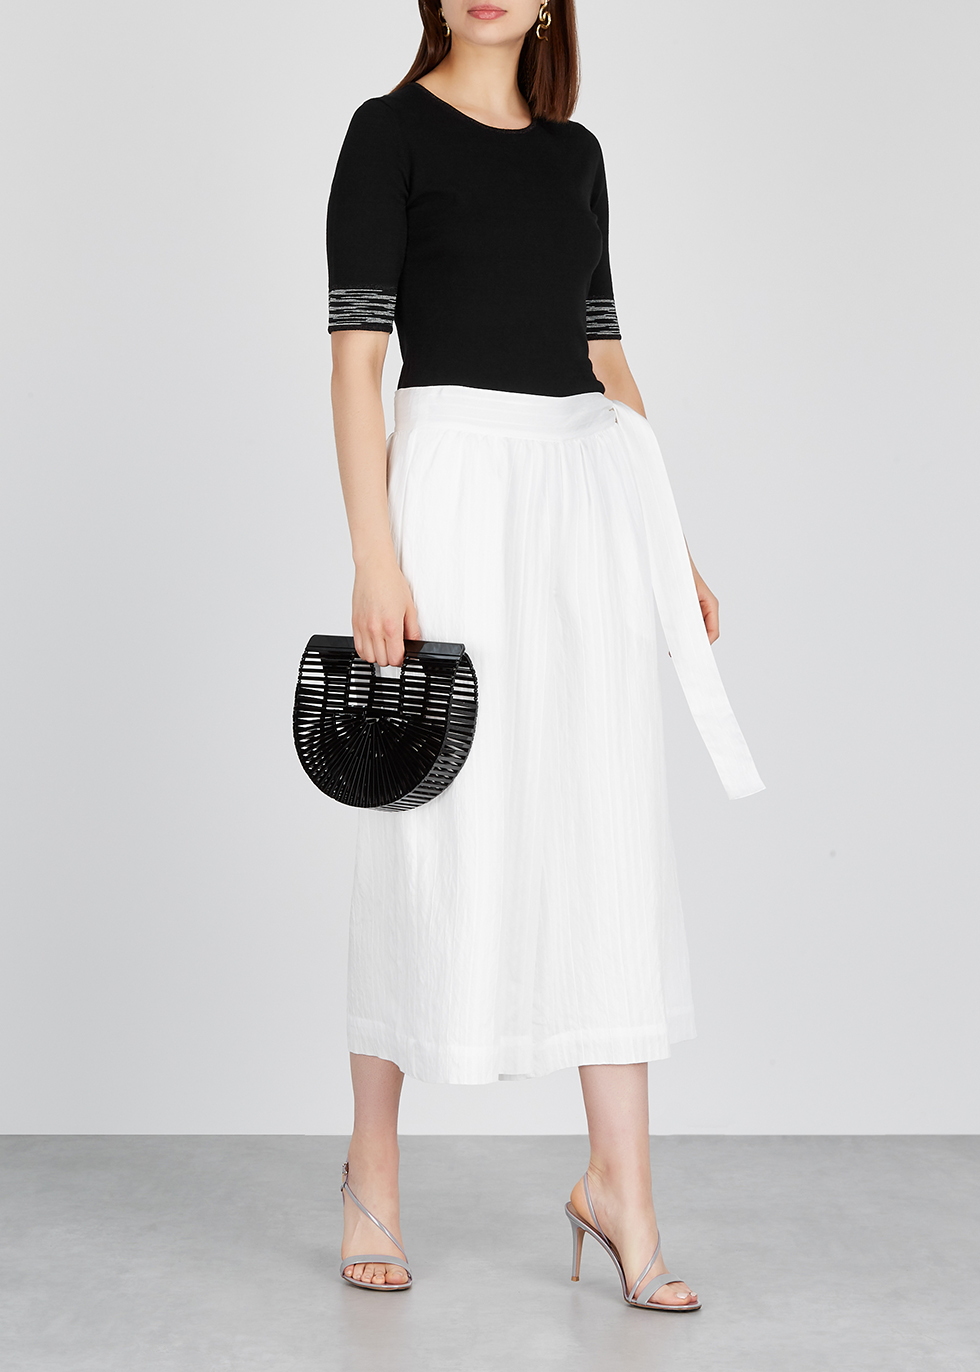 cb3077c621 M Missoni Dresses, Tops, Cardigans, Skirts, Bags - Harvey Nichols